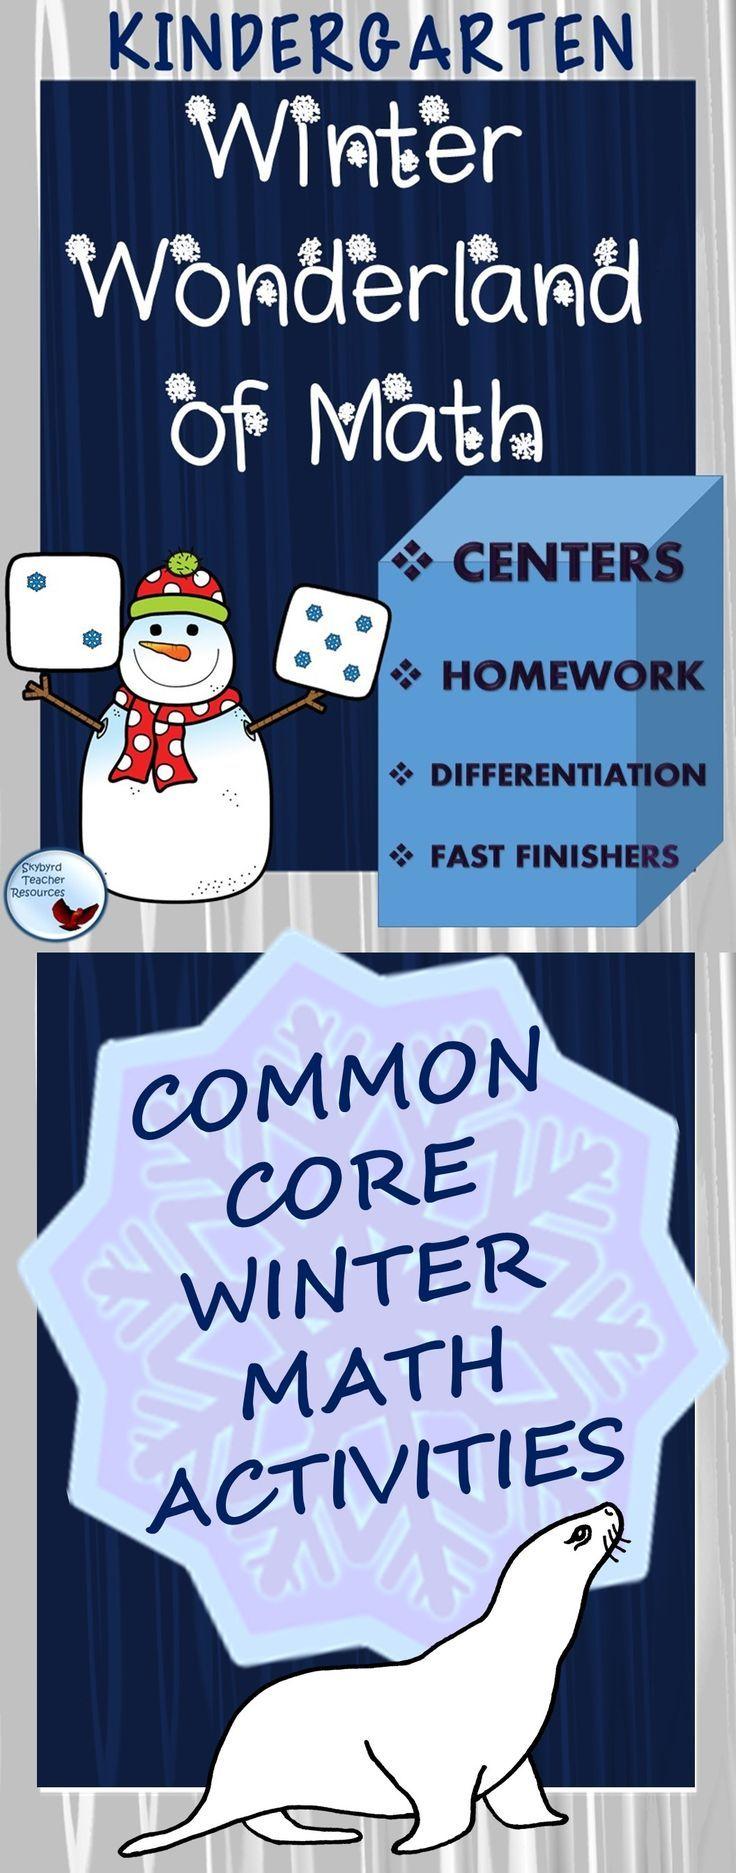 Math: Kindergarten Winter Wonderland Math Activities and Worksheets ...